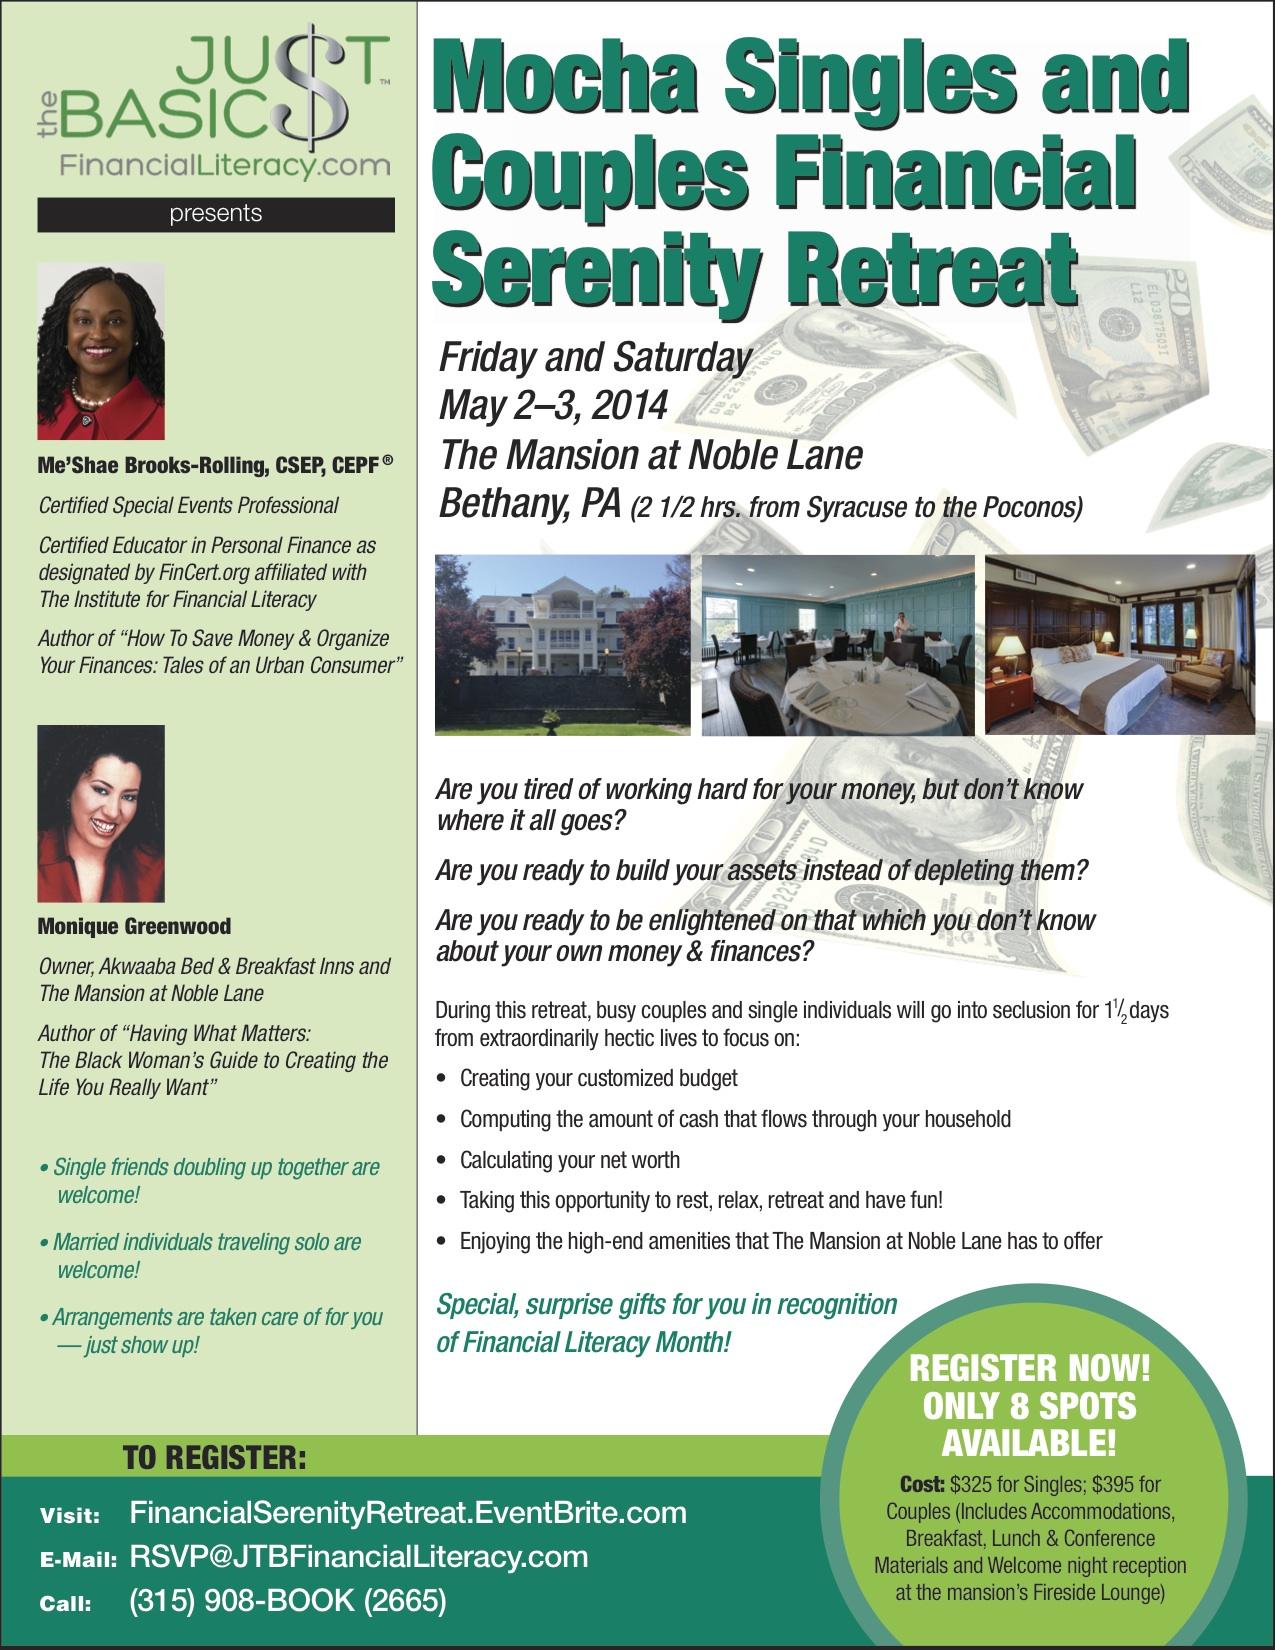 Financial Serenity Retreat Final Flyer